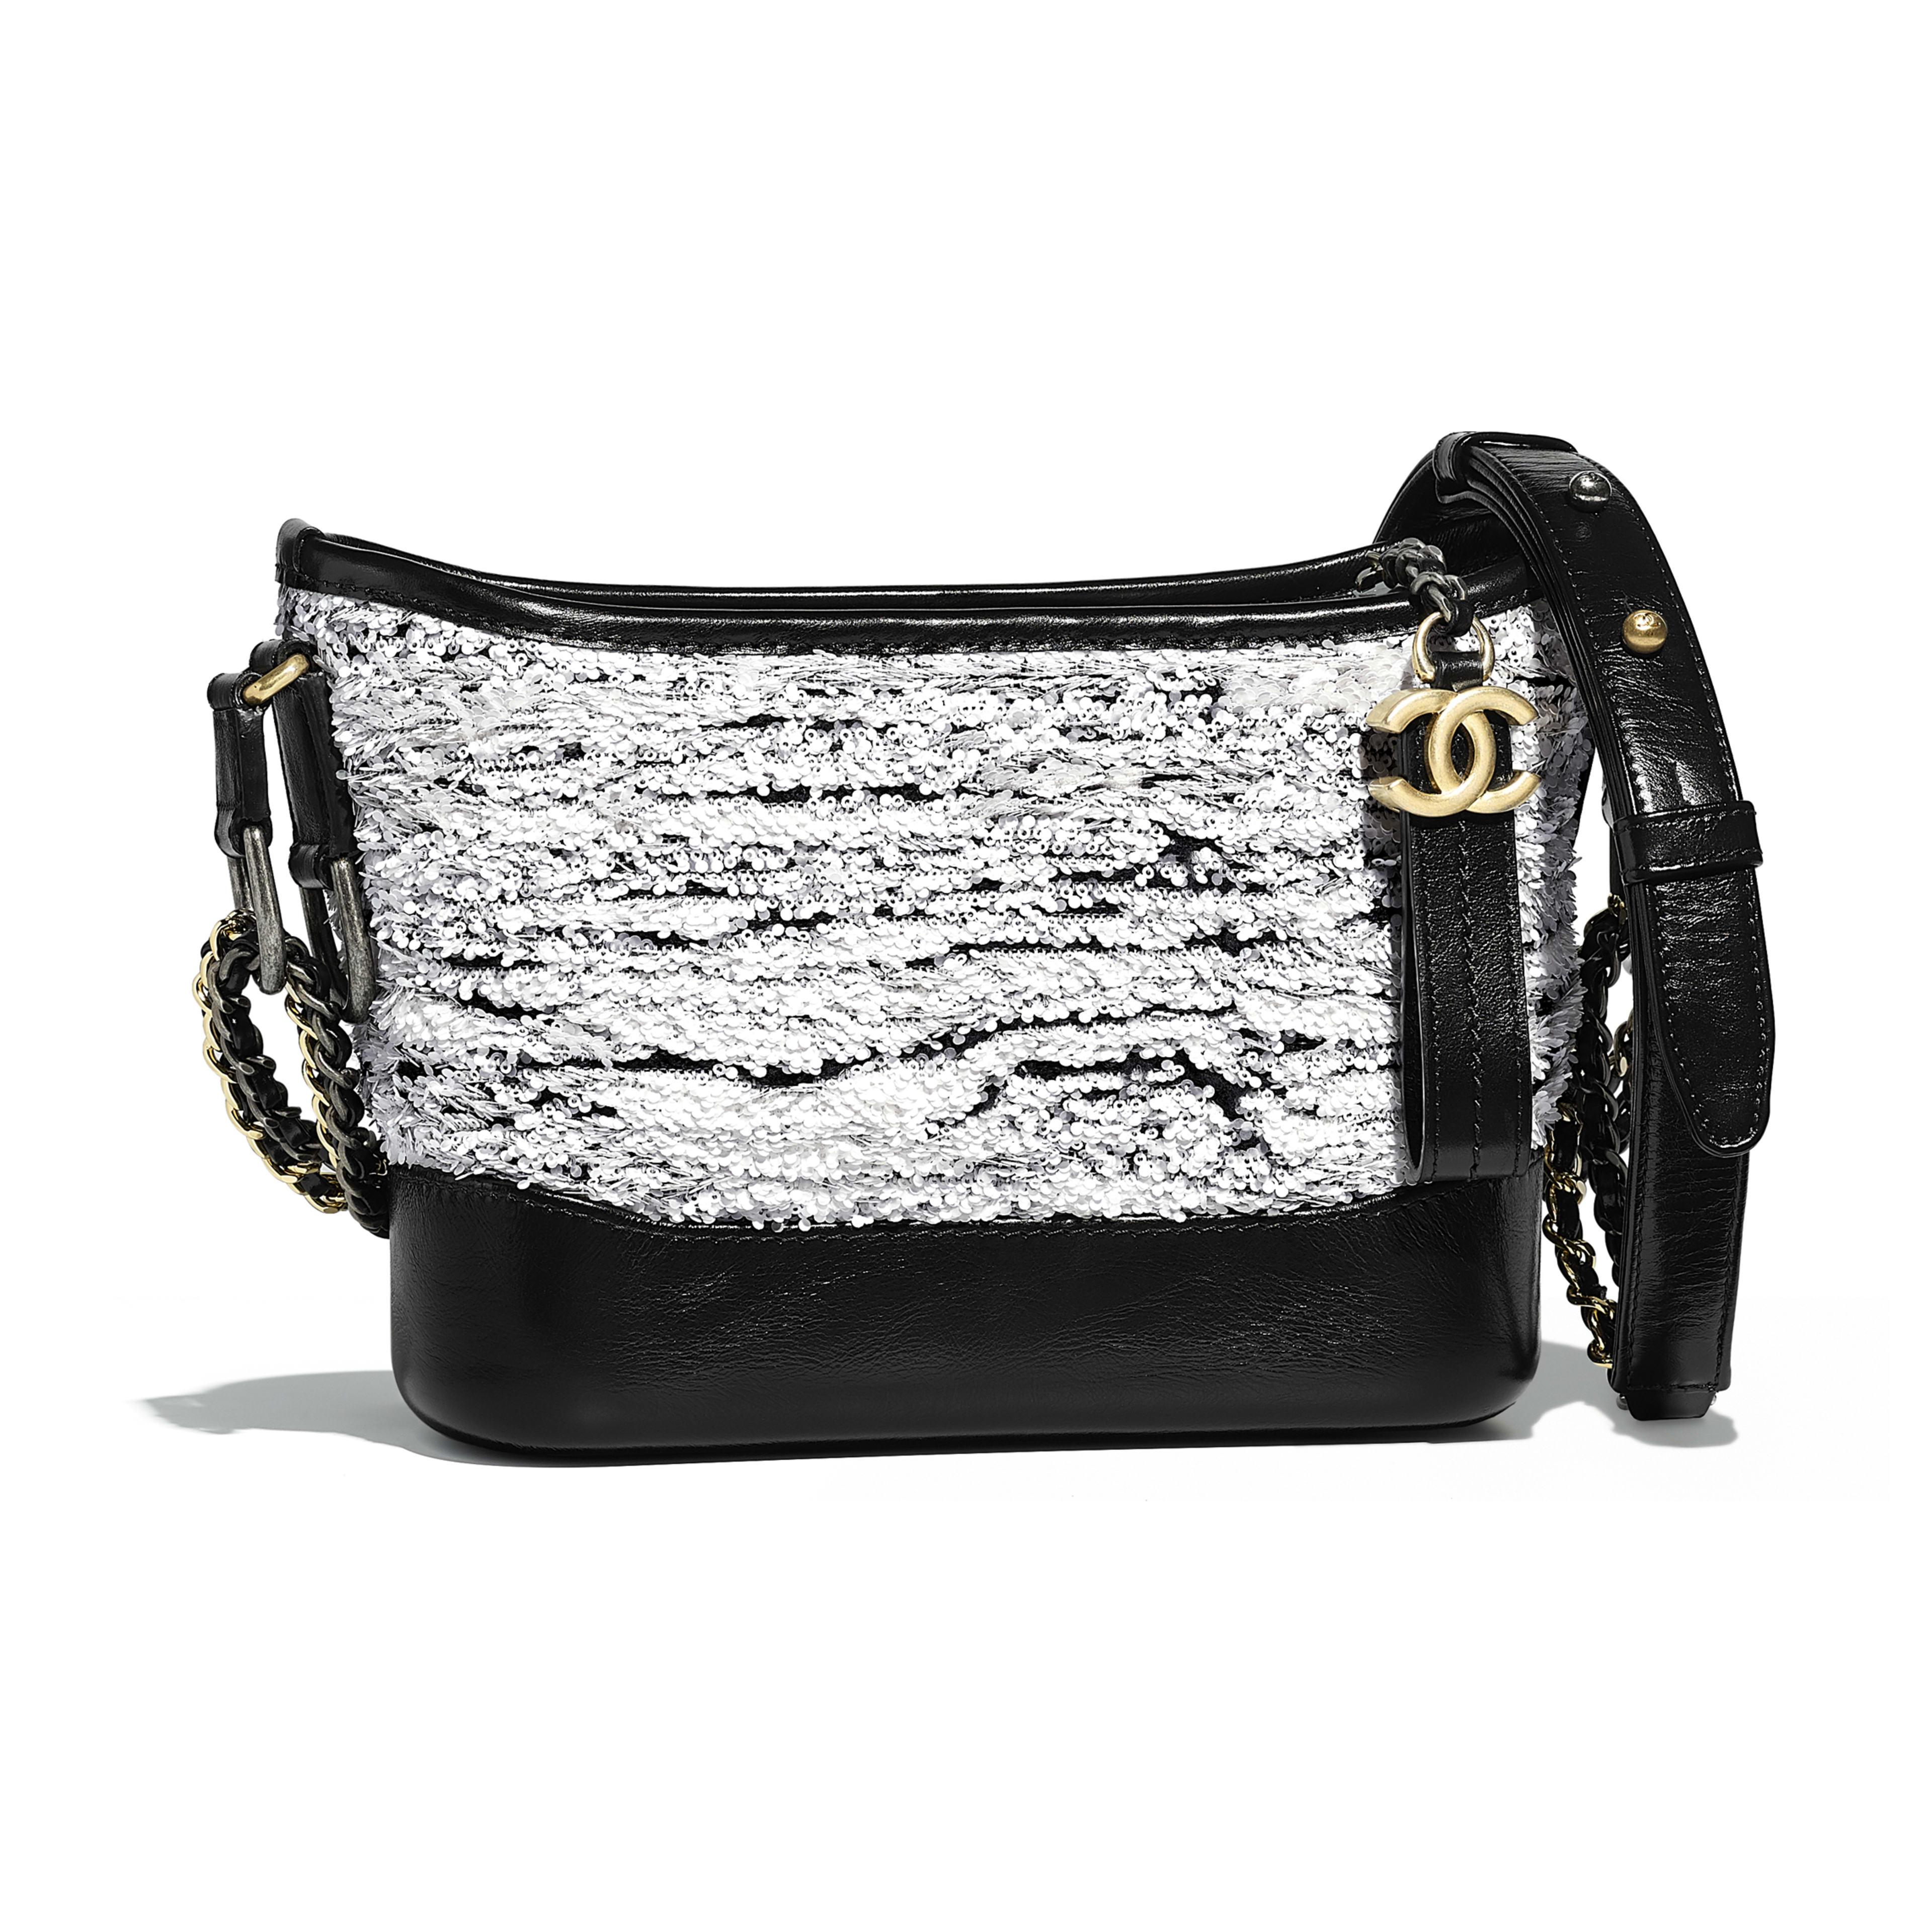 Chanel S Gabrielle Small Hobo Bag White Black Sequins Wool Calfskin